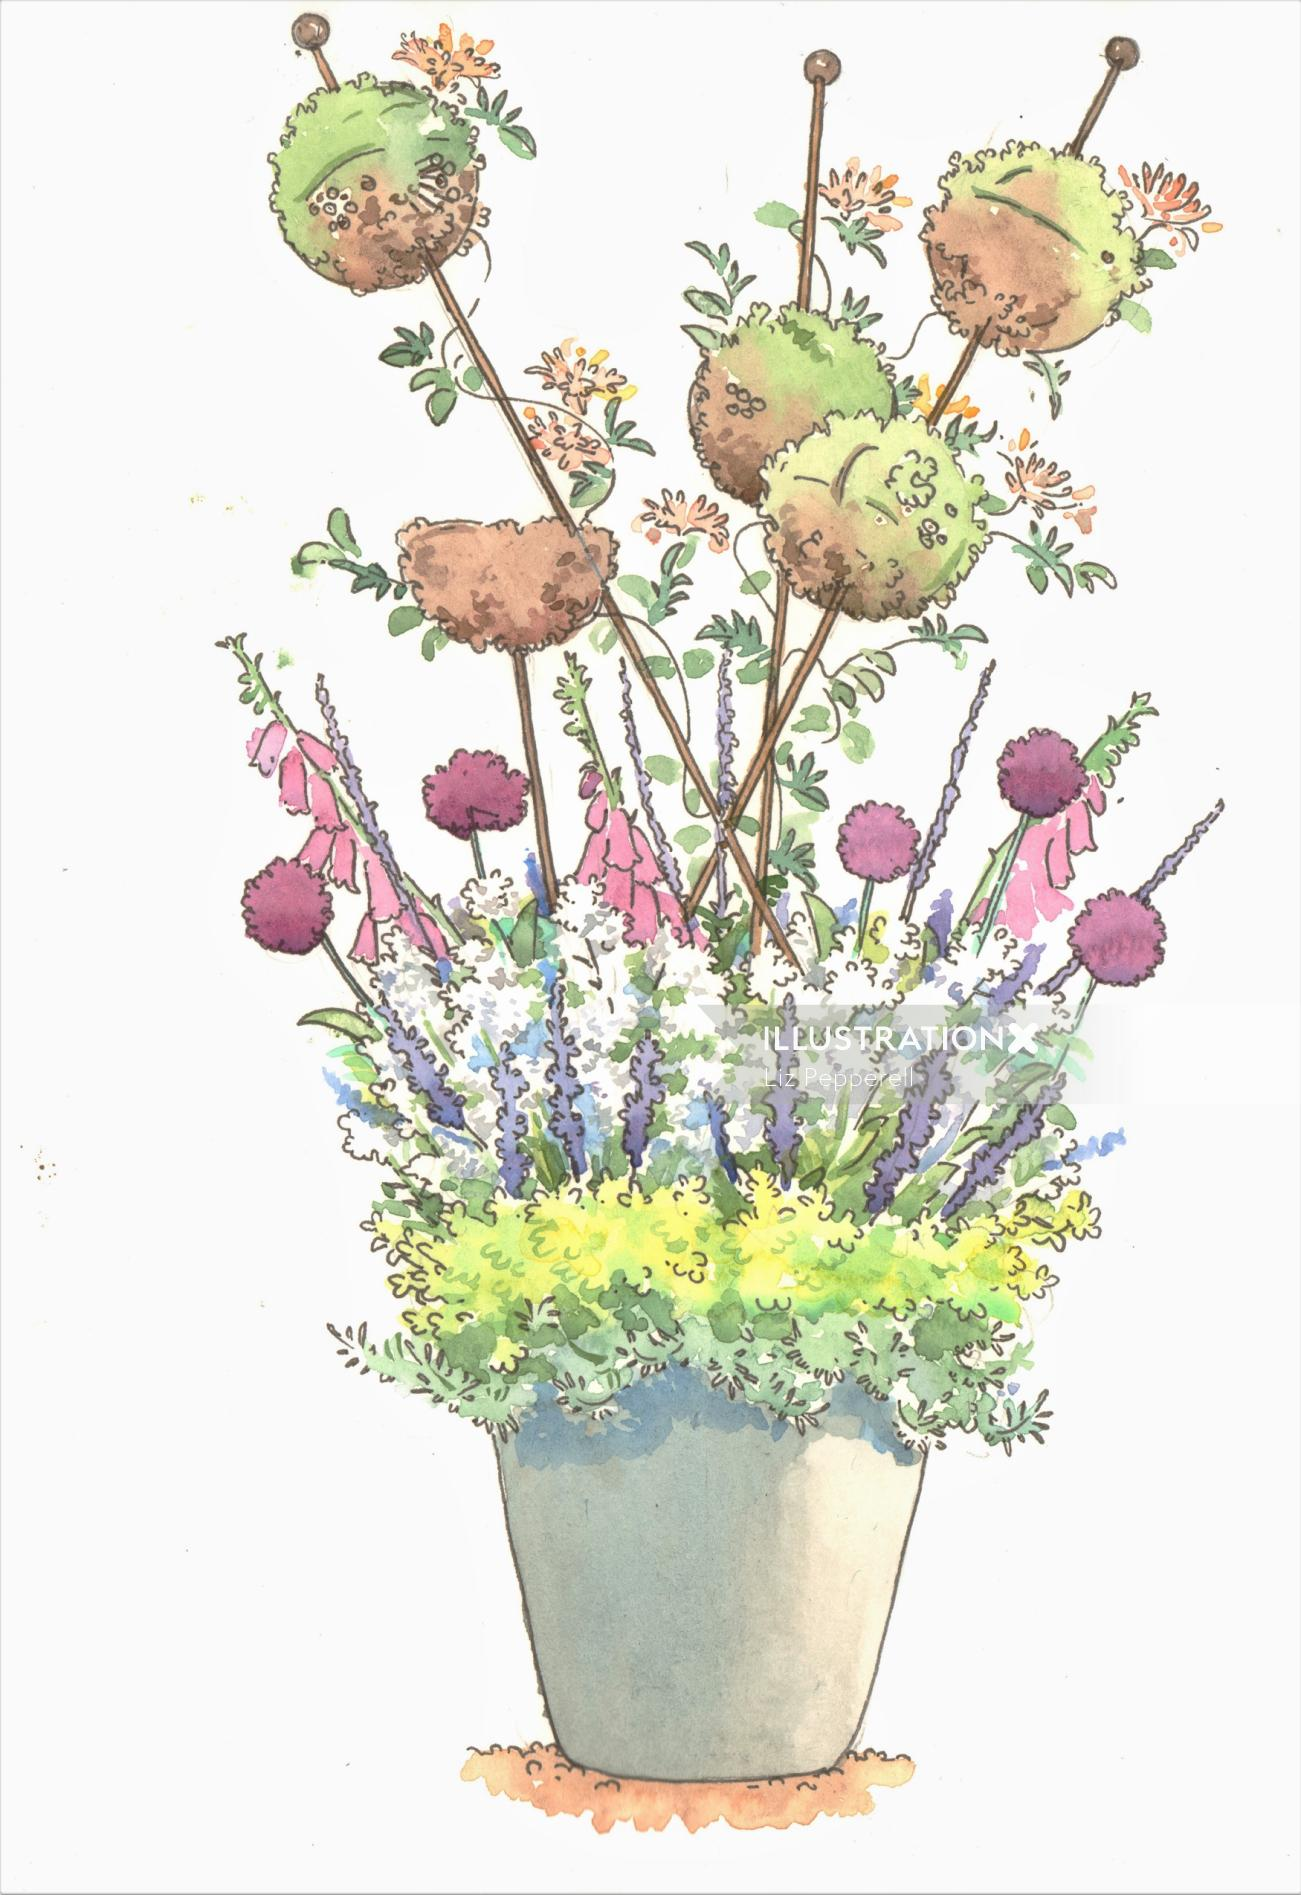 Illustration of pollinators plot